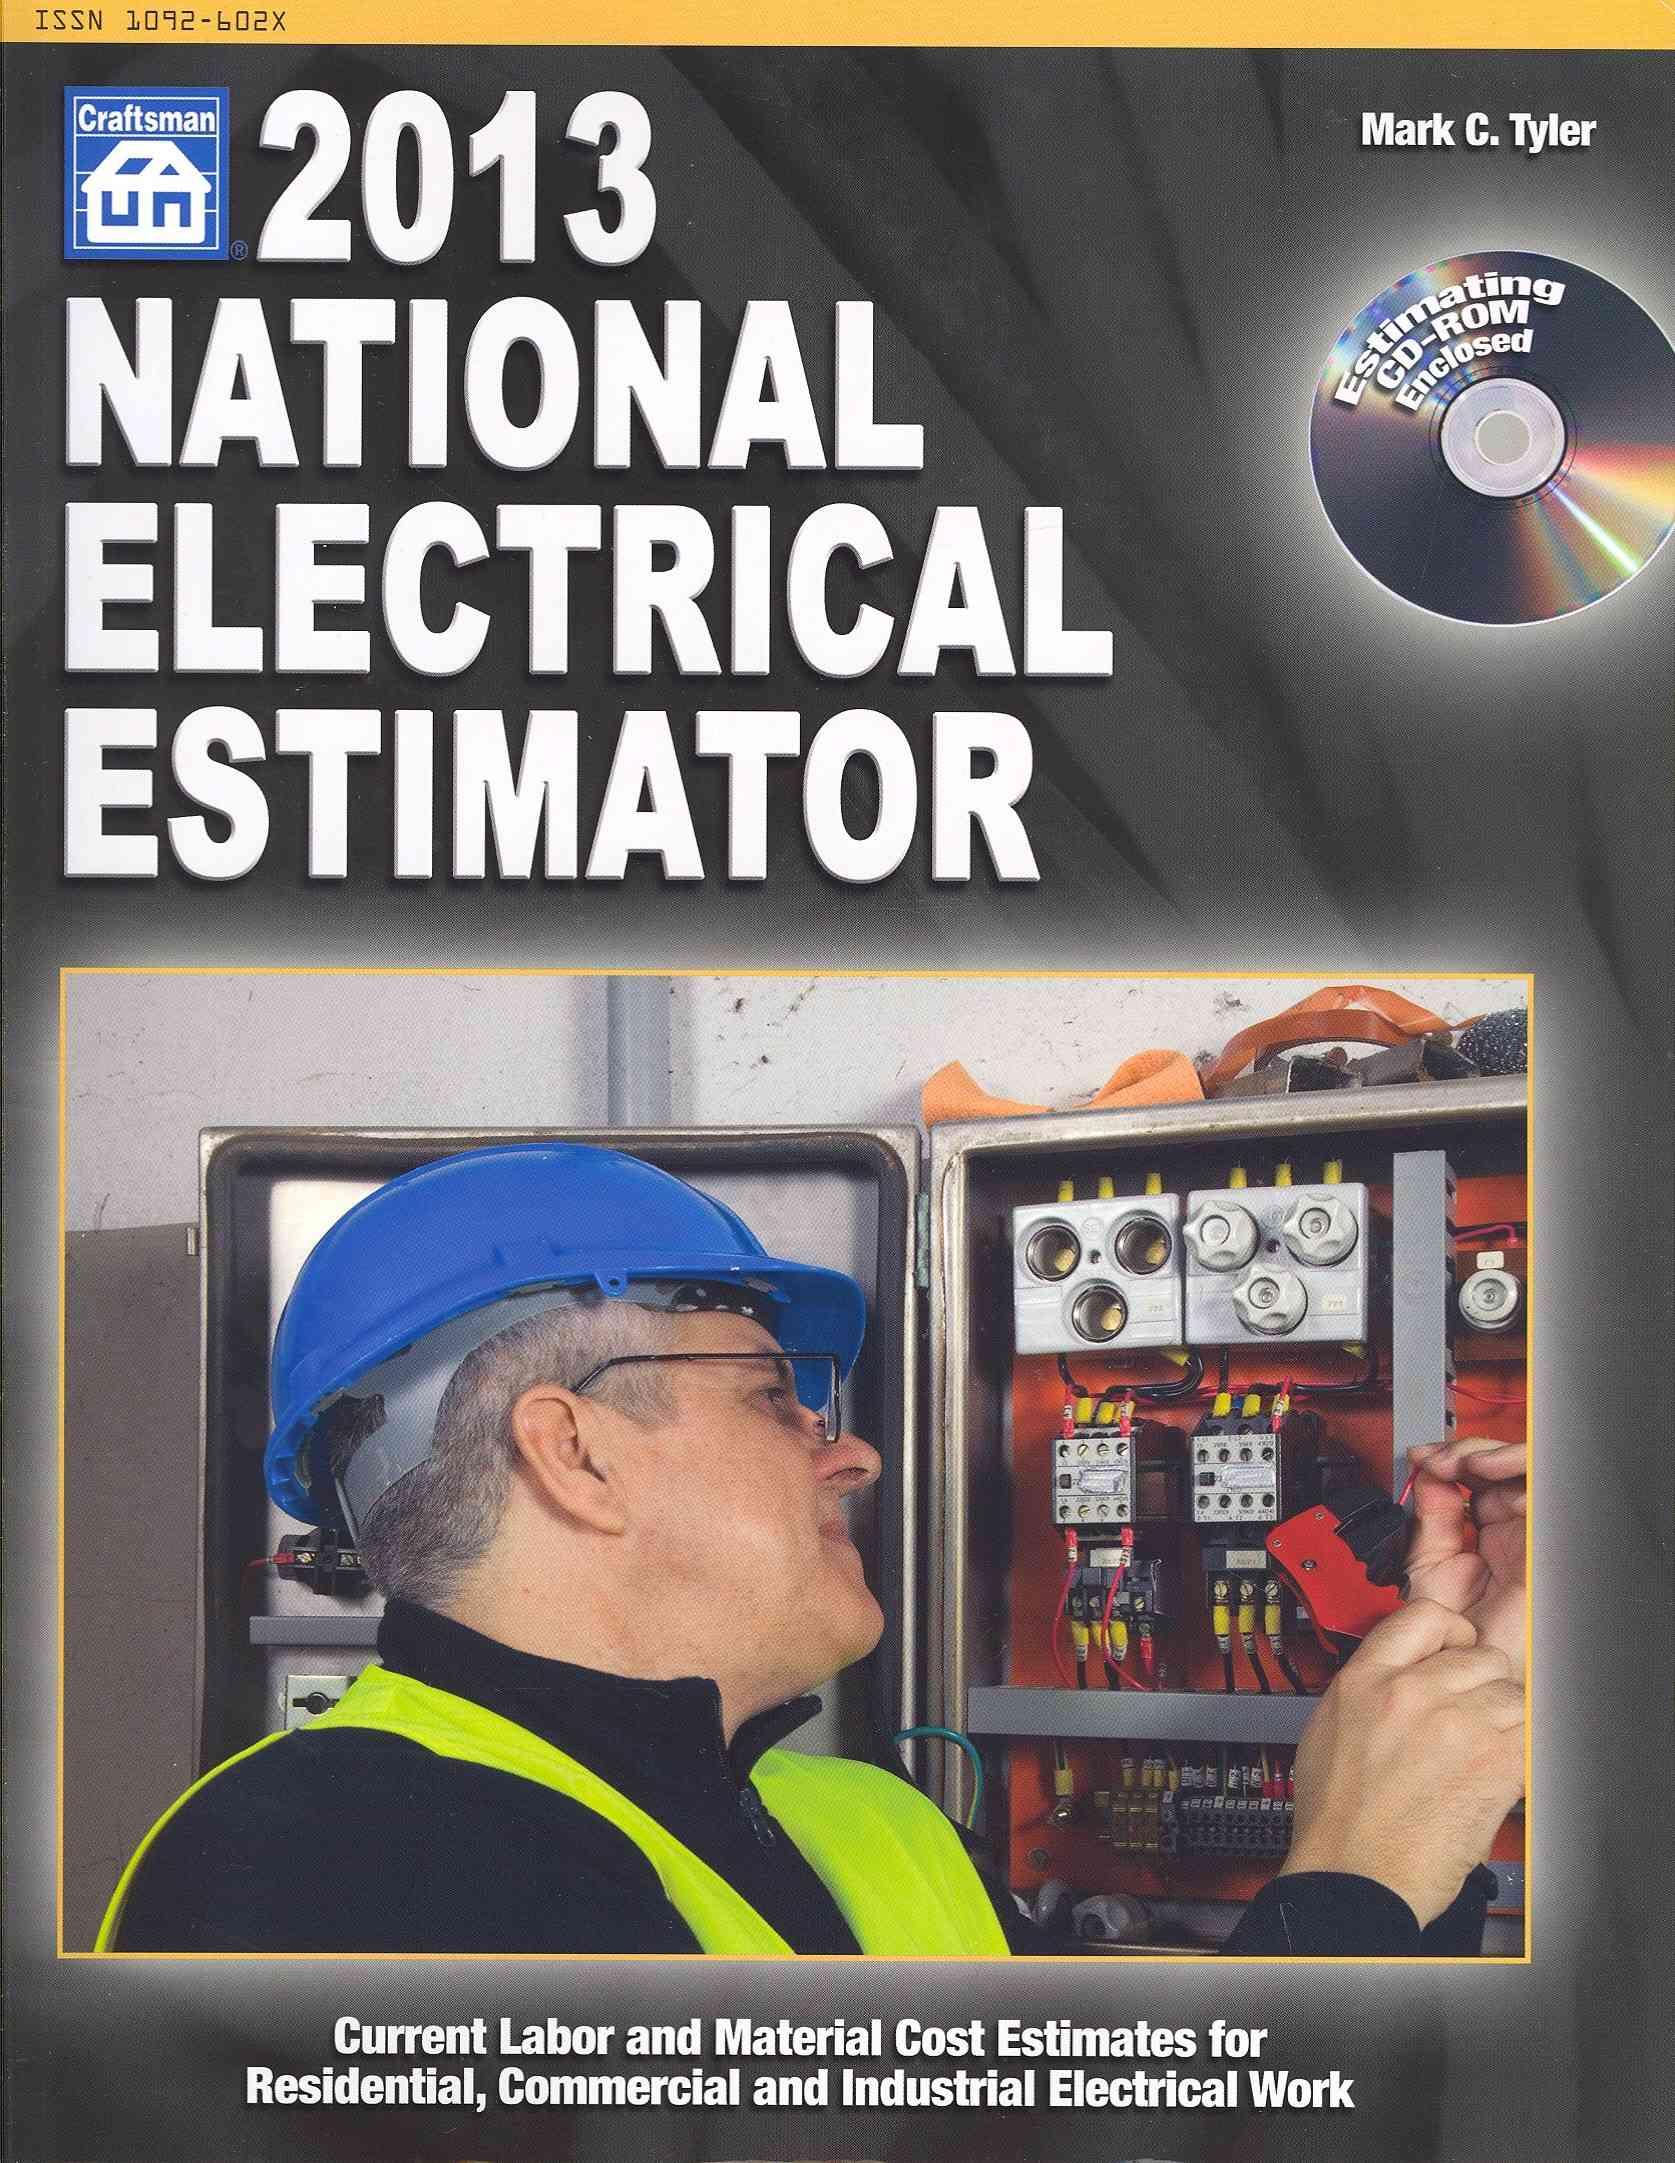 National Electrical Estimator 2013